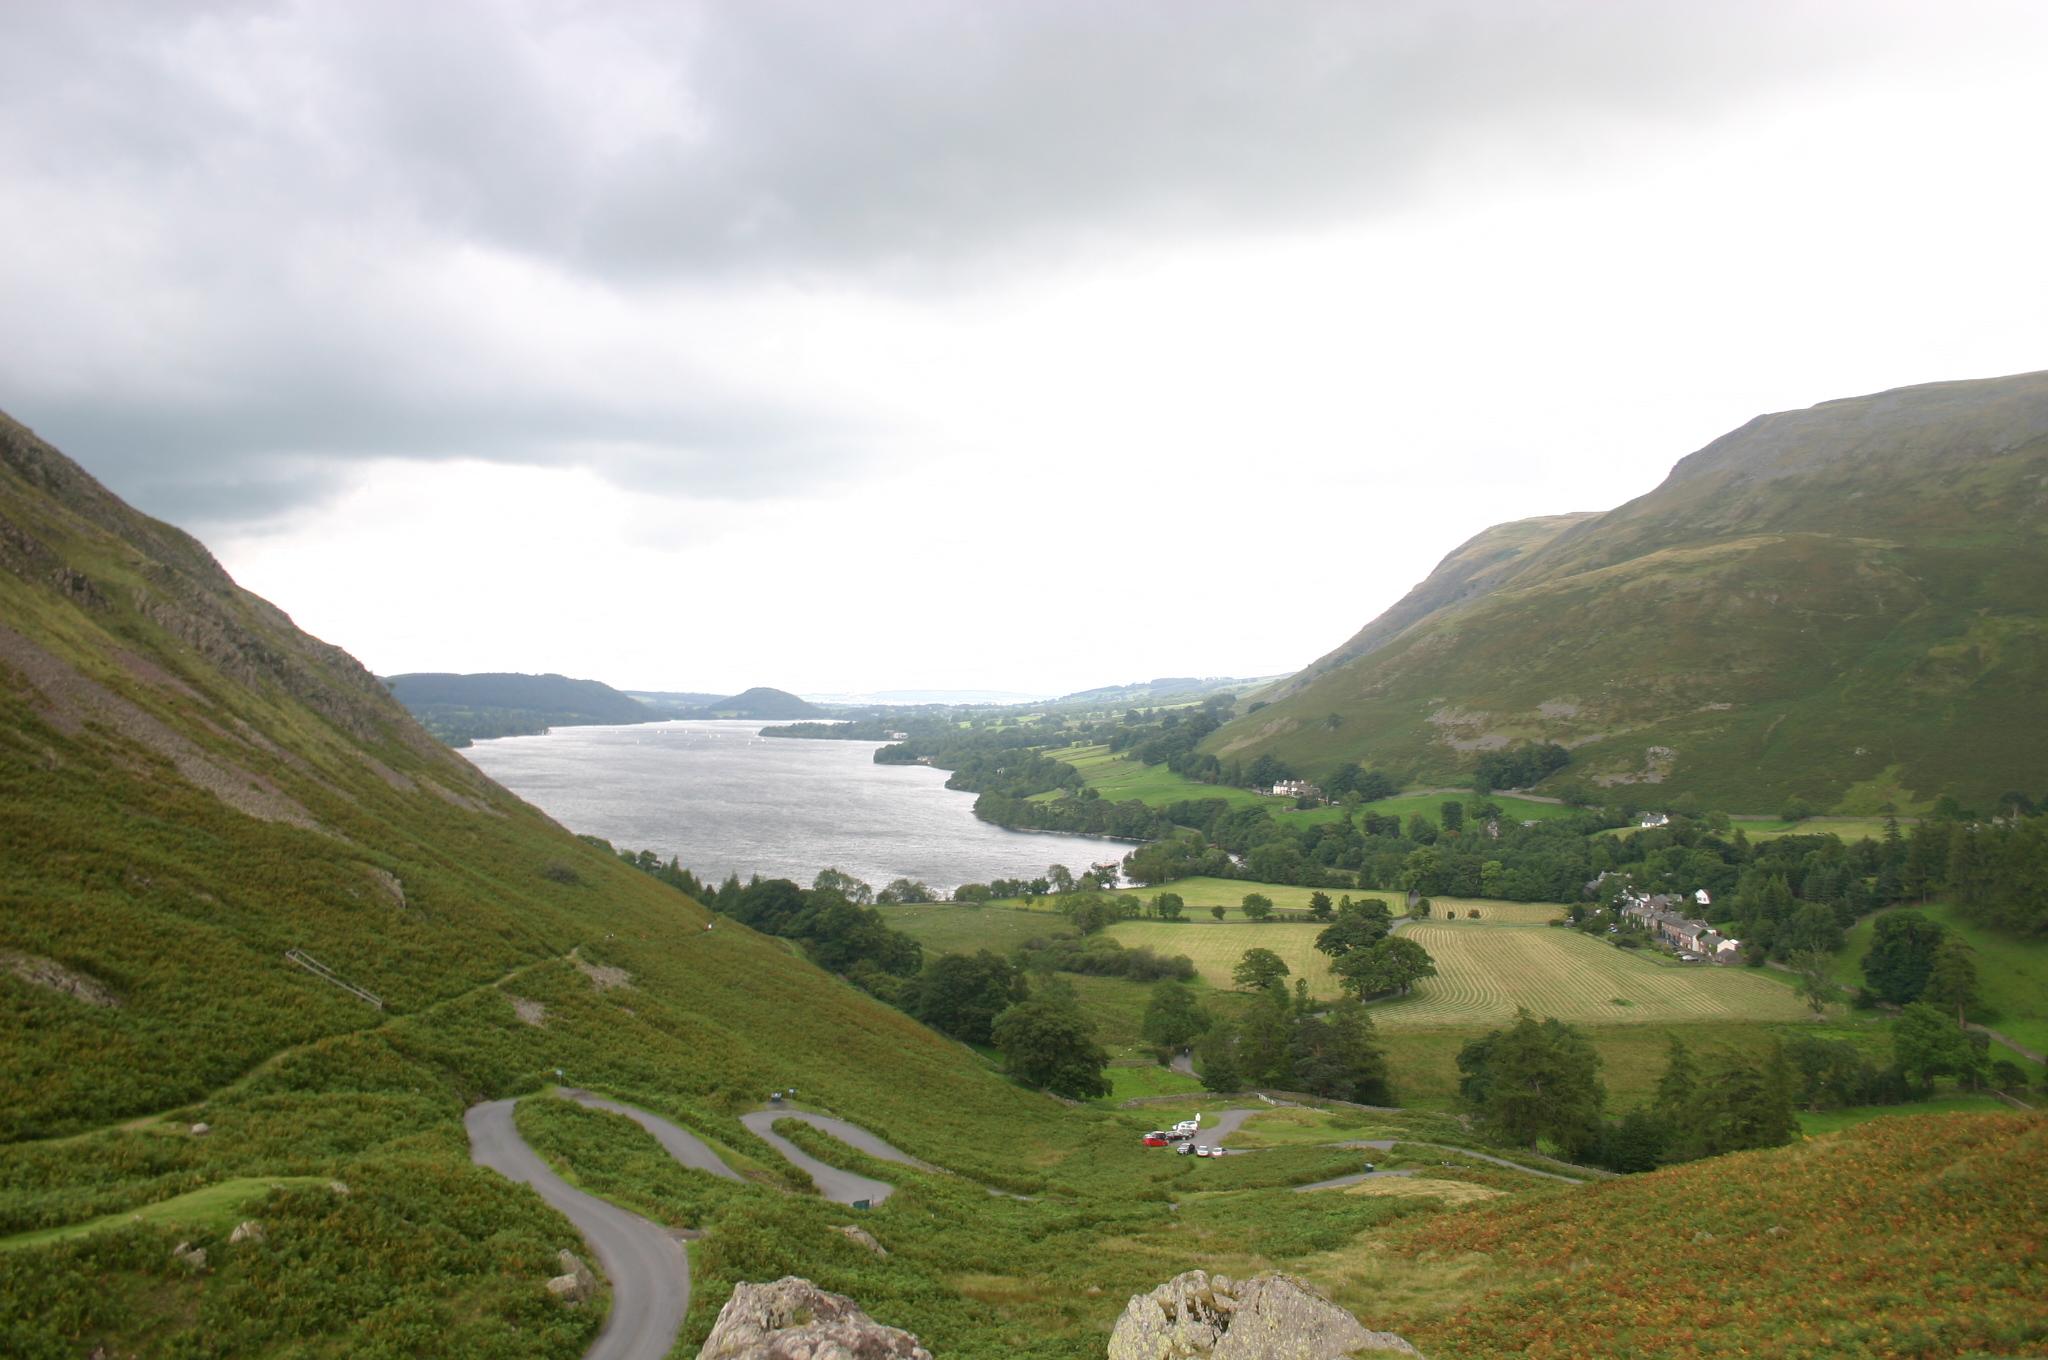 The Lake District: Houghton, Ullswater